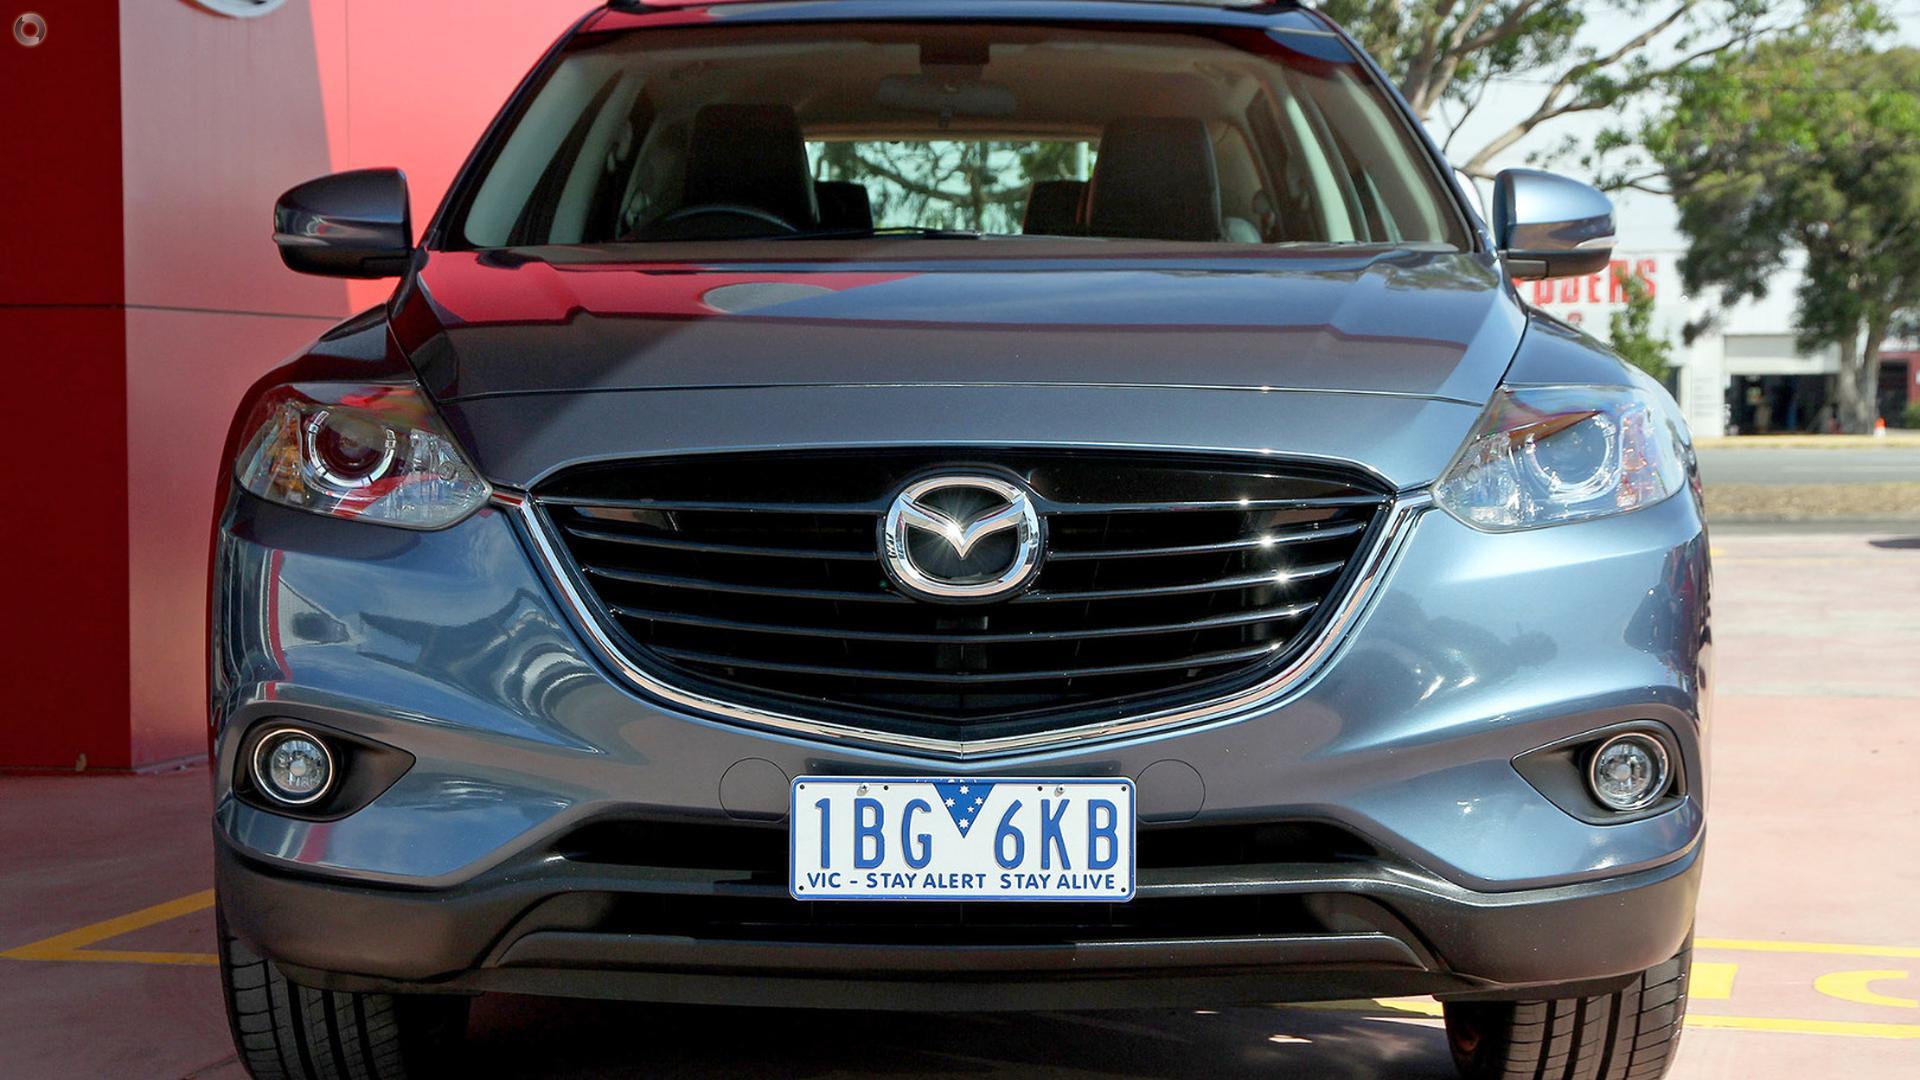 2013 Mazda Cx-9 Luxury TB Series 5